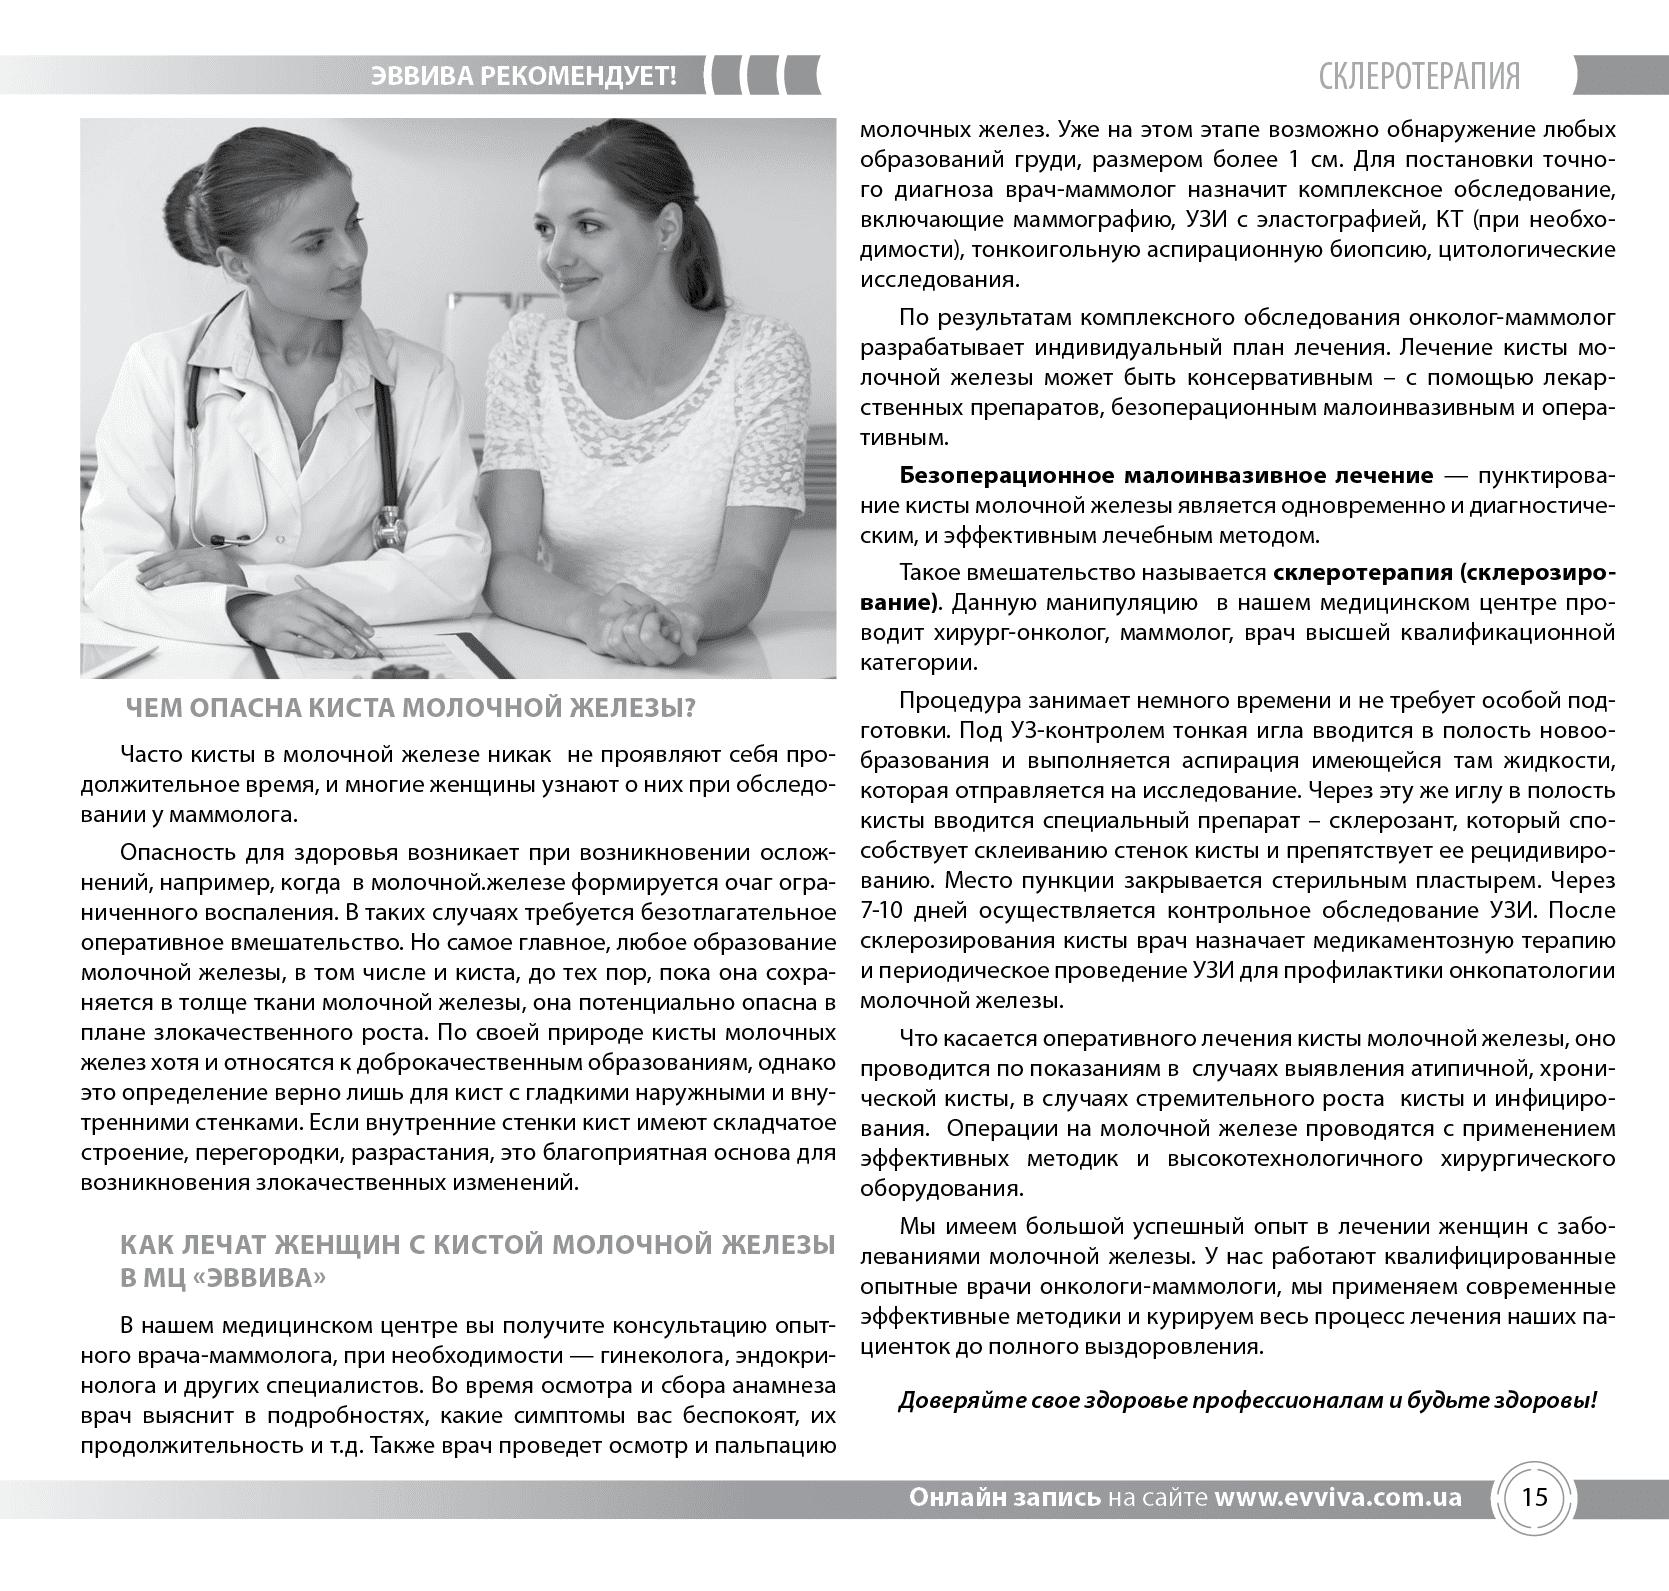 evviva-zhurnal-118-page15